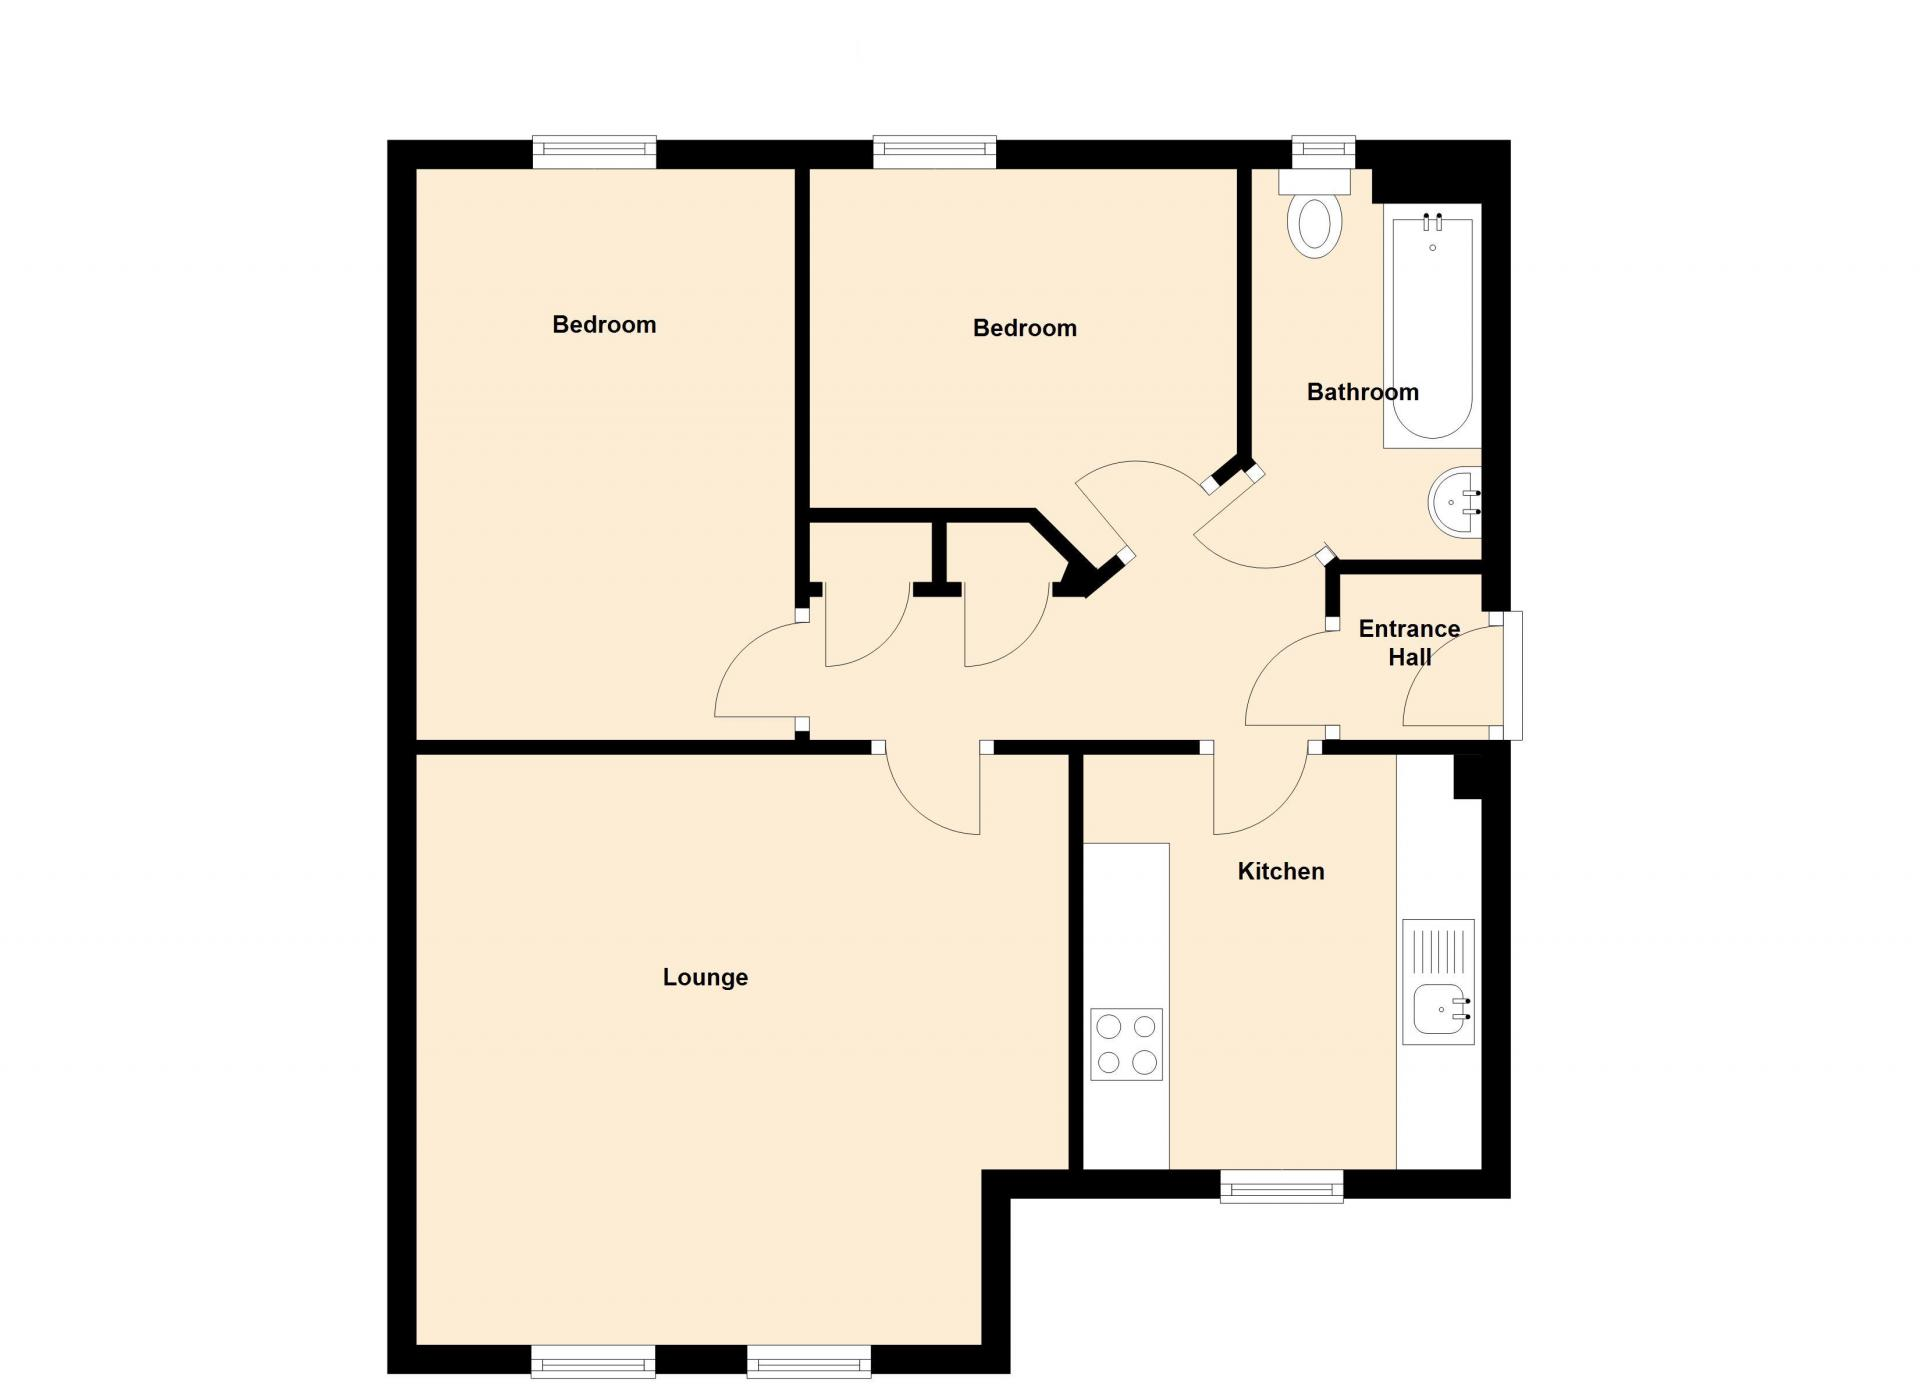 Floor plan 1 at Barley Mews Apartments, Centre, Peterborough